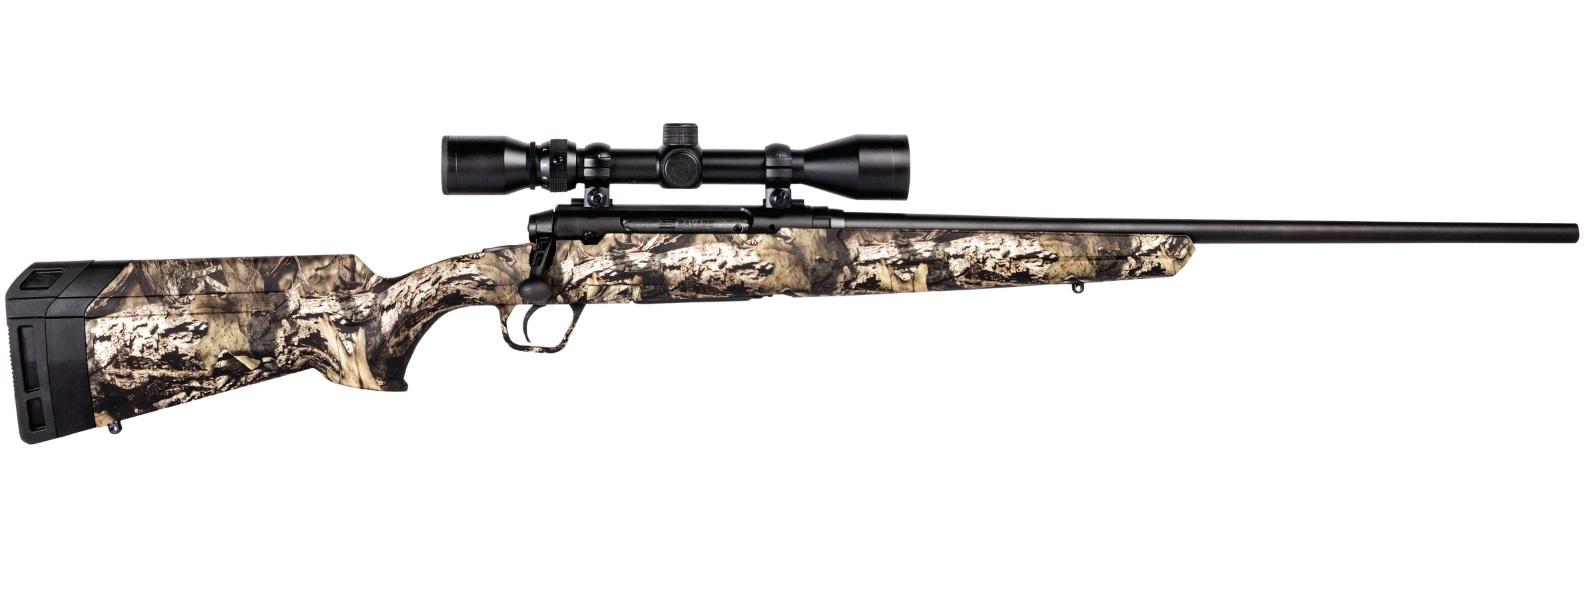 Savage Arms Axis XP Camo 22-250